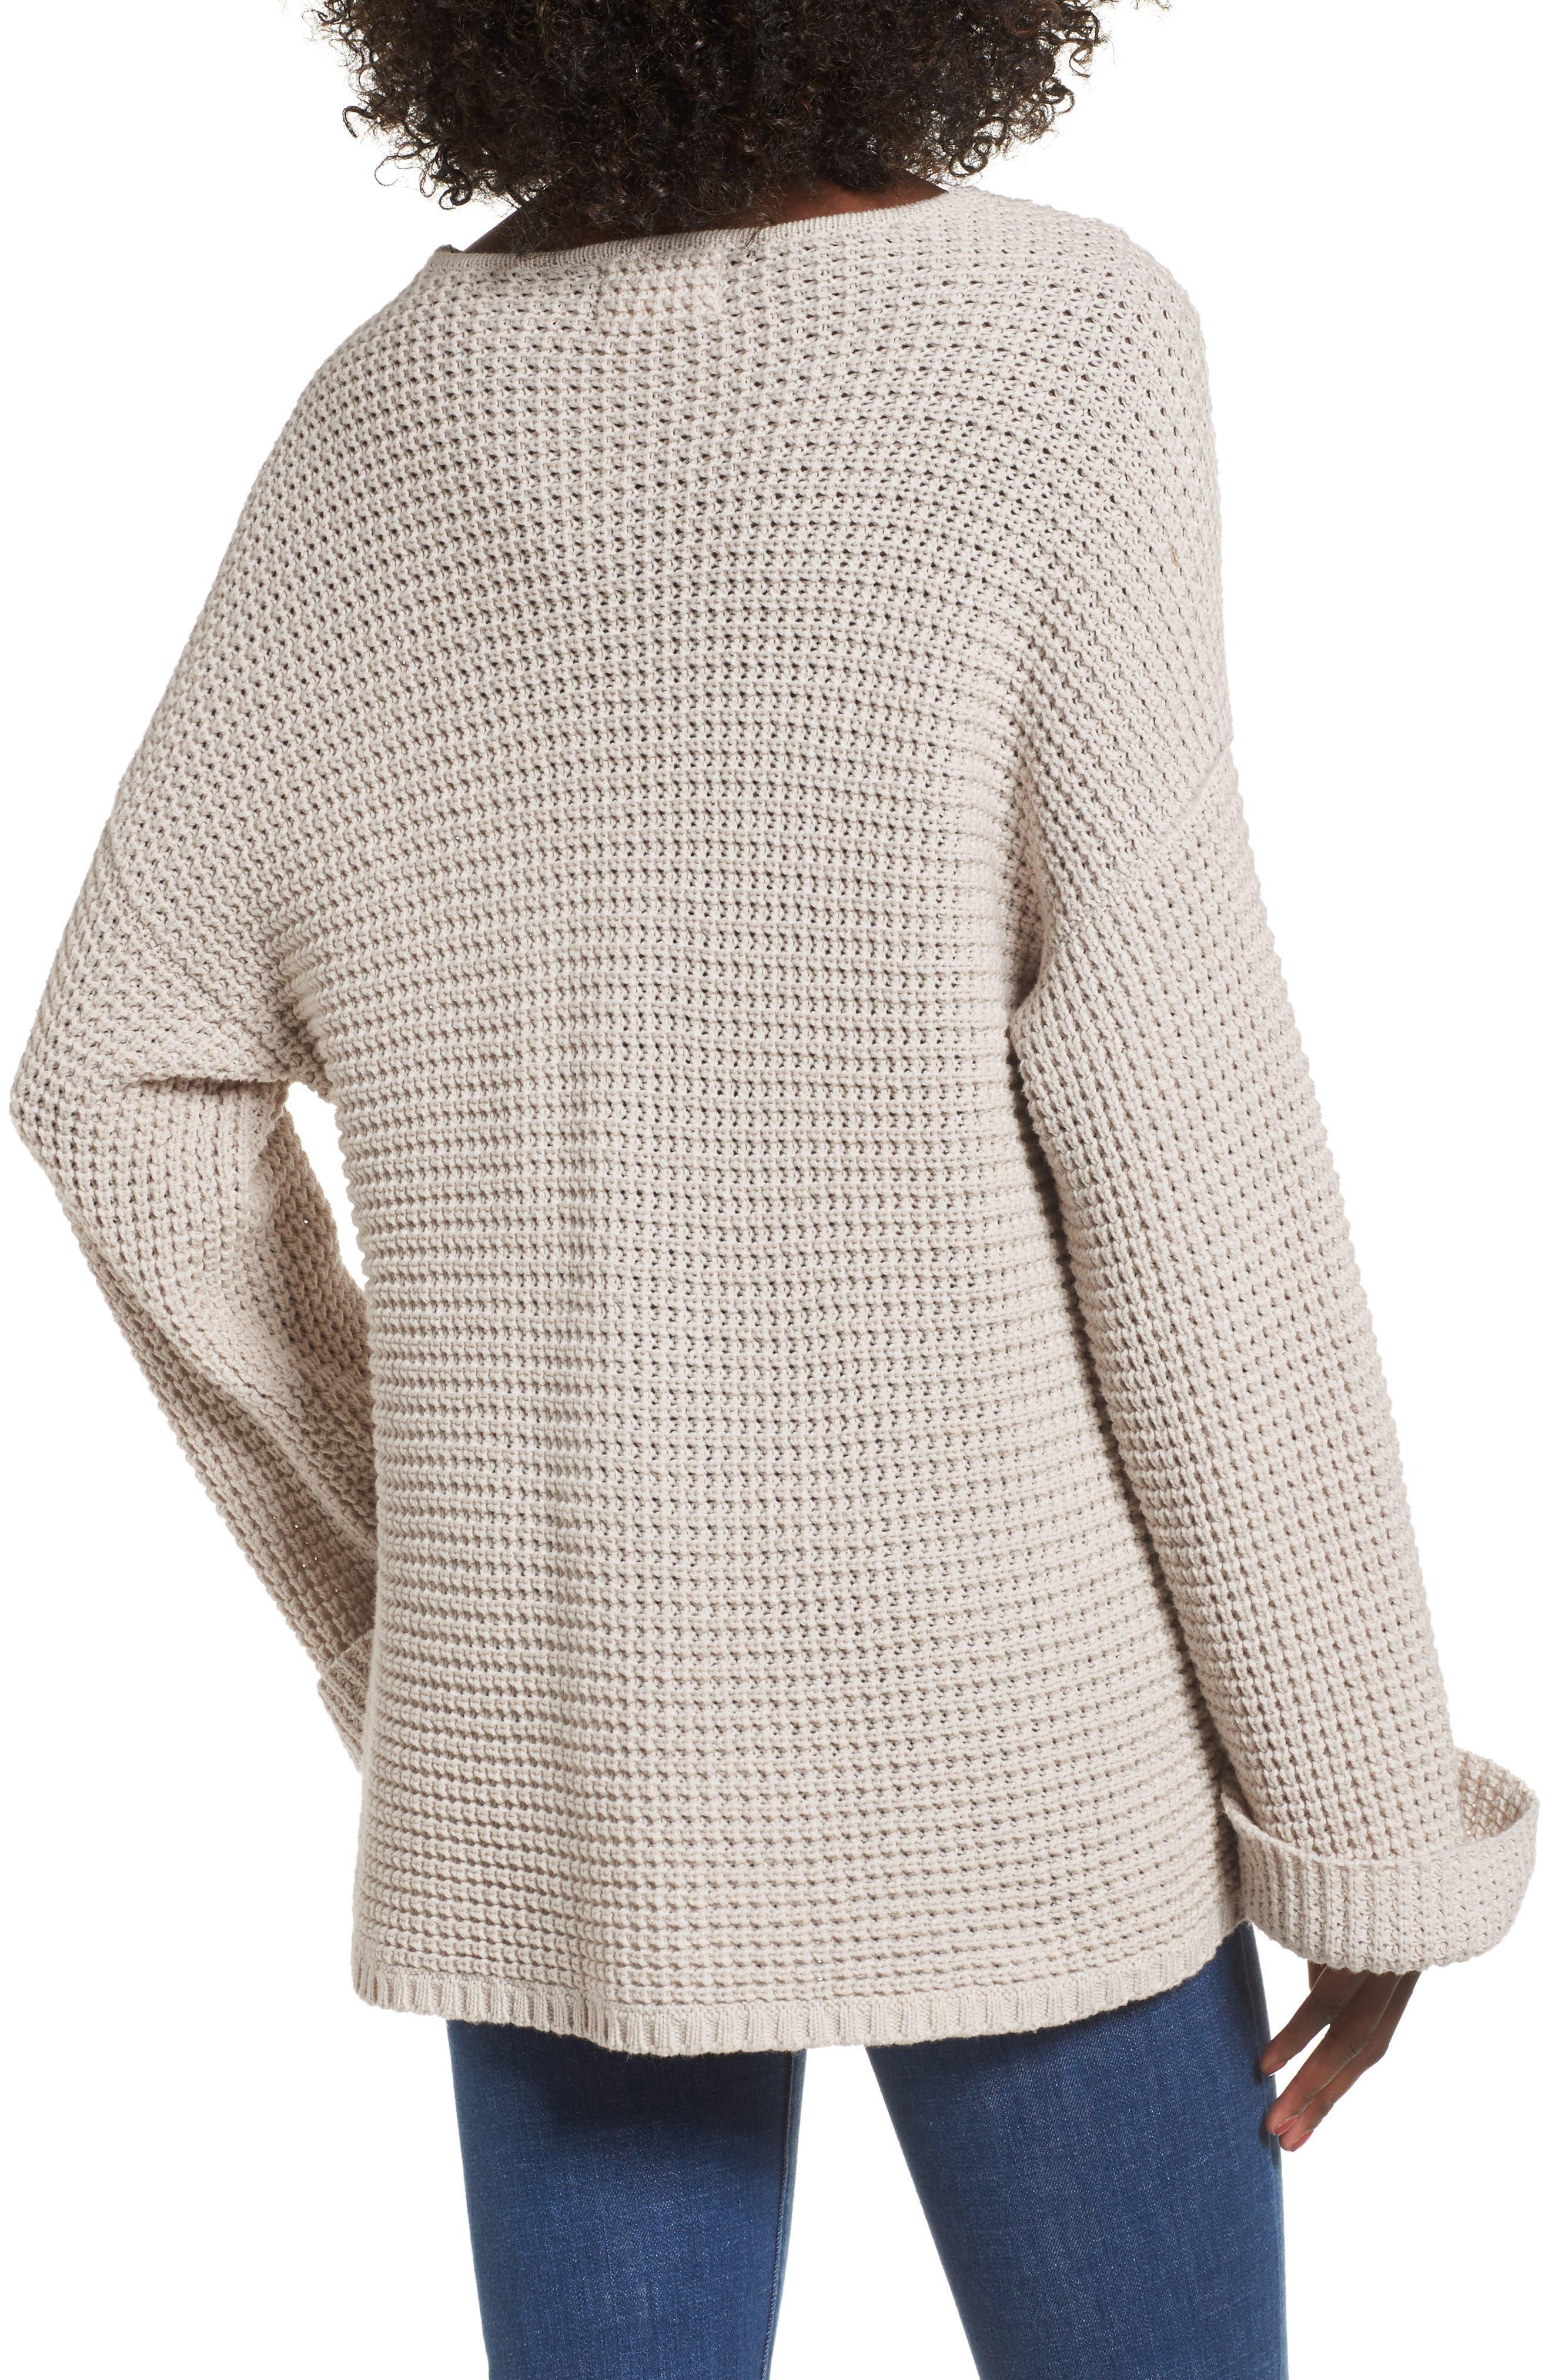 Adelia Bell Sleeve Sweater,                             Alternate thumbnail 2, color,                             900